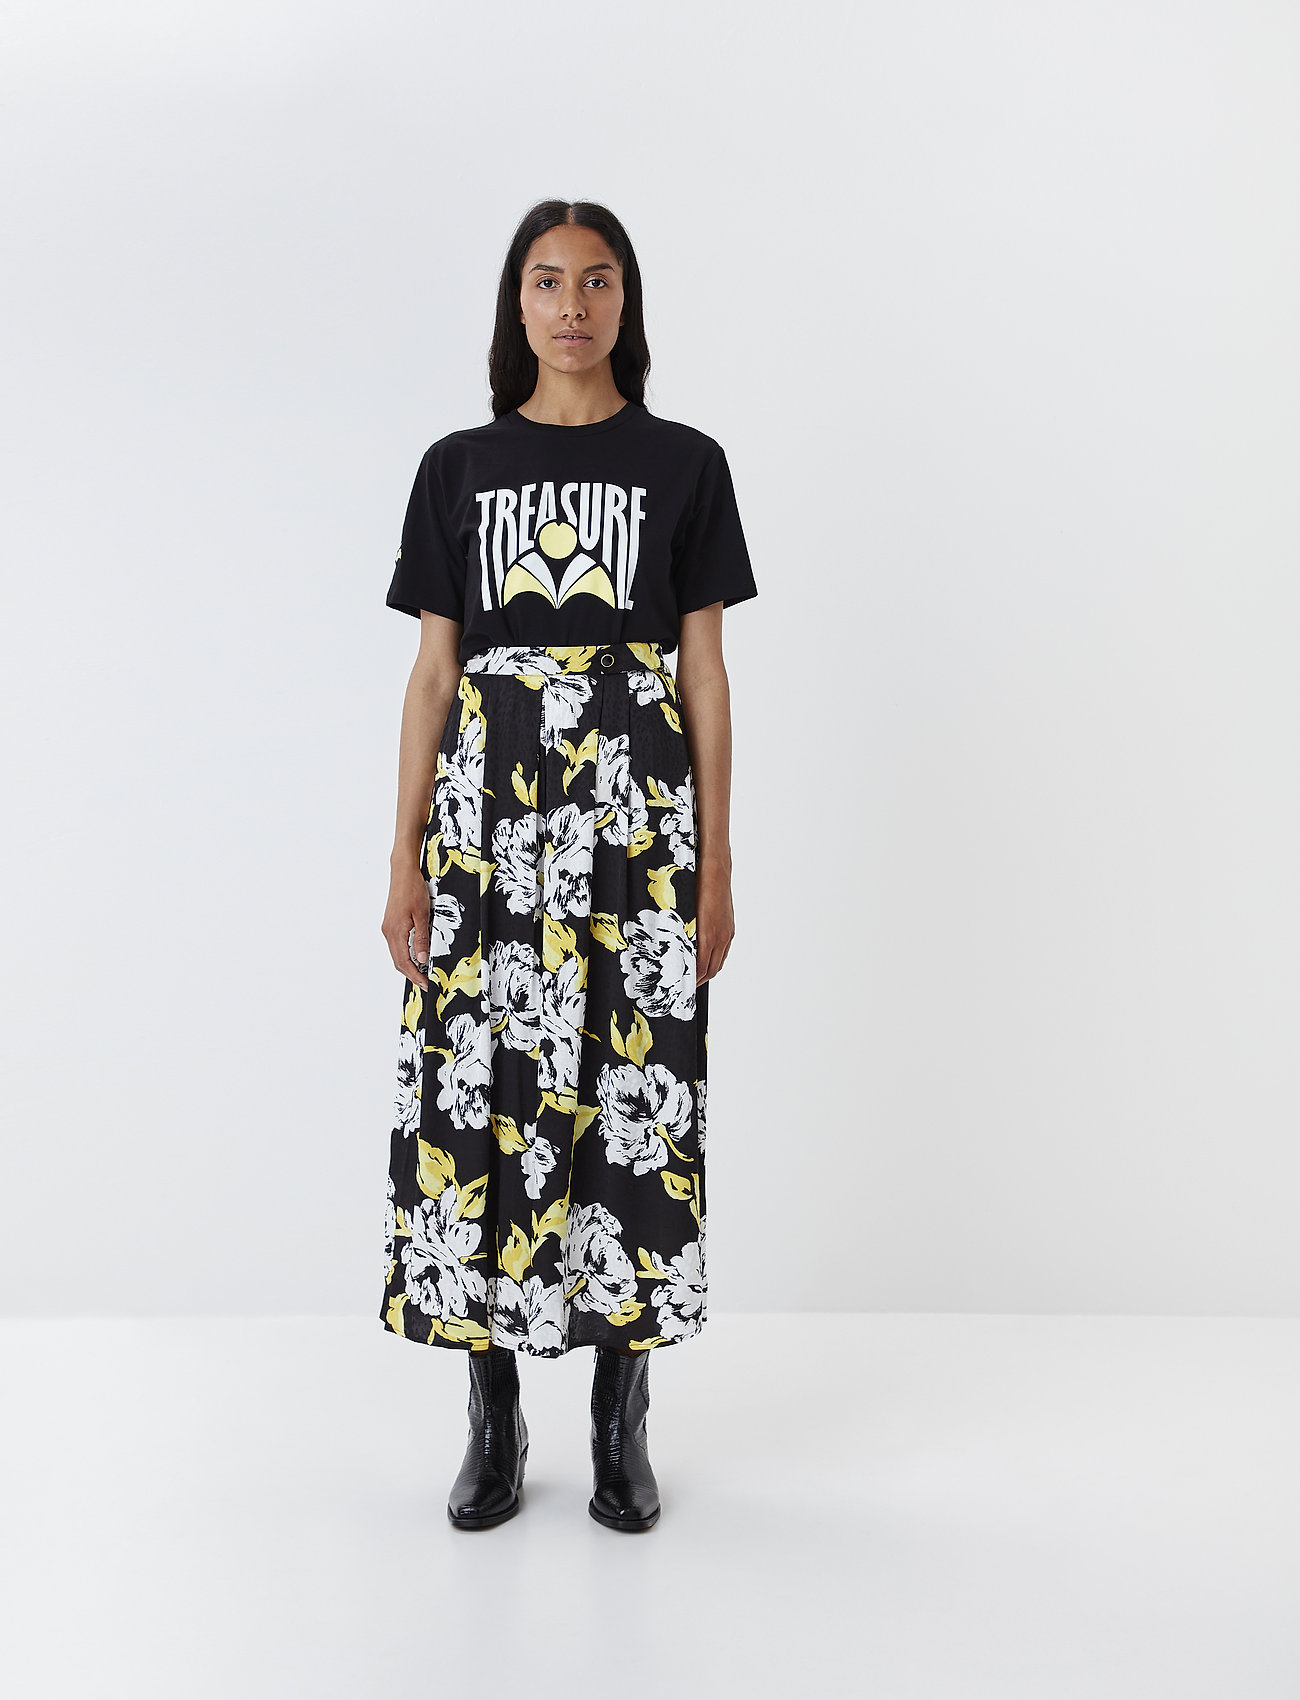 Gestuz - TreasureGZ tee MS20 - printed t-shirts - black - 0